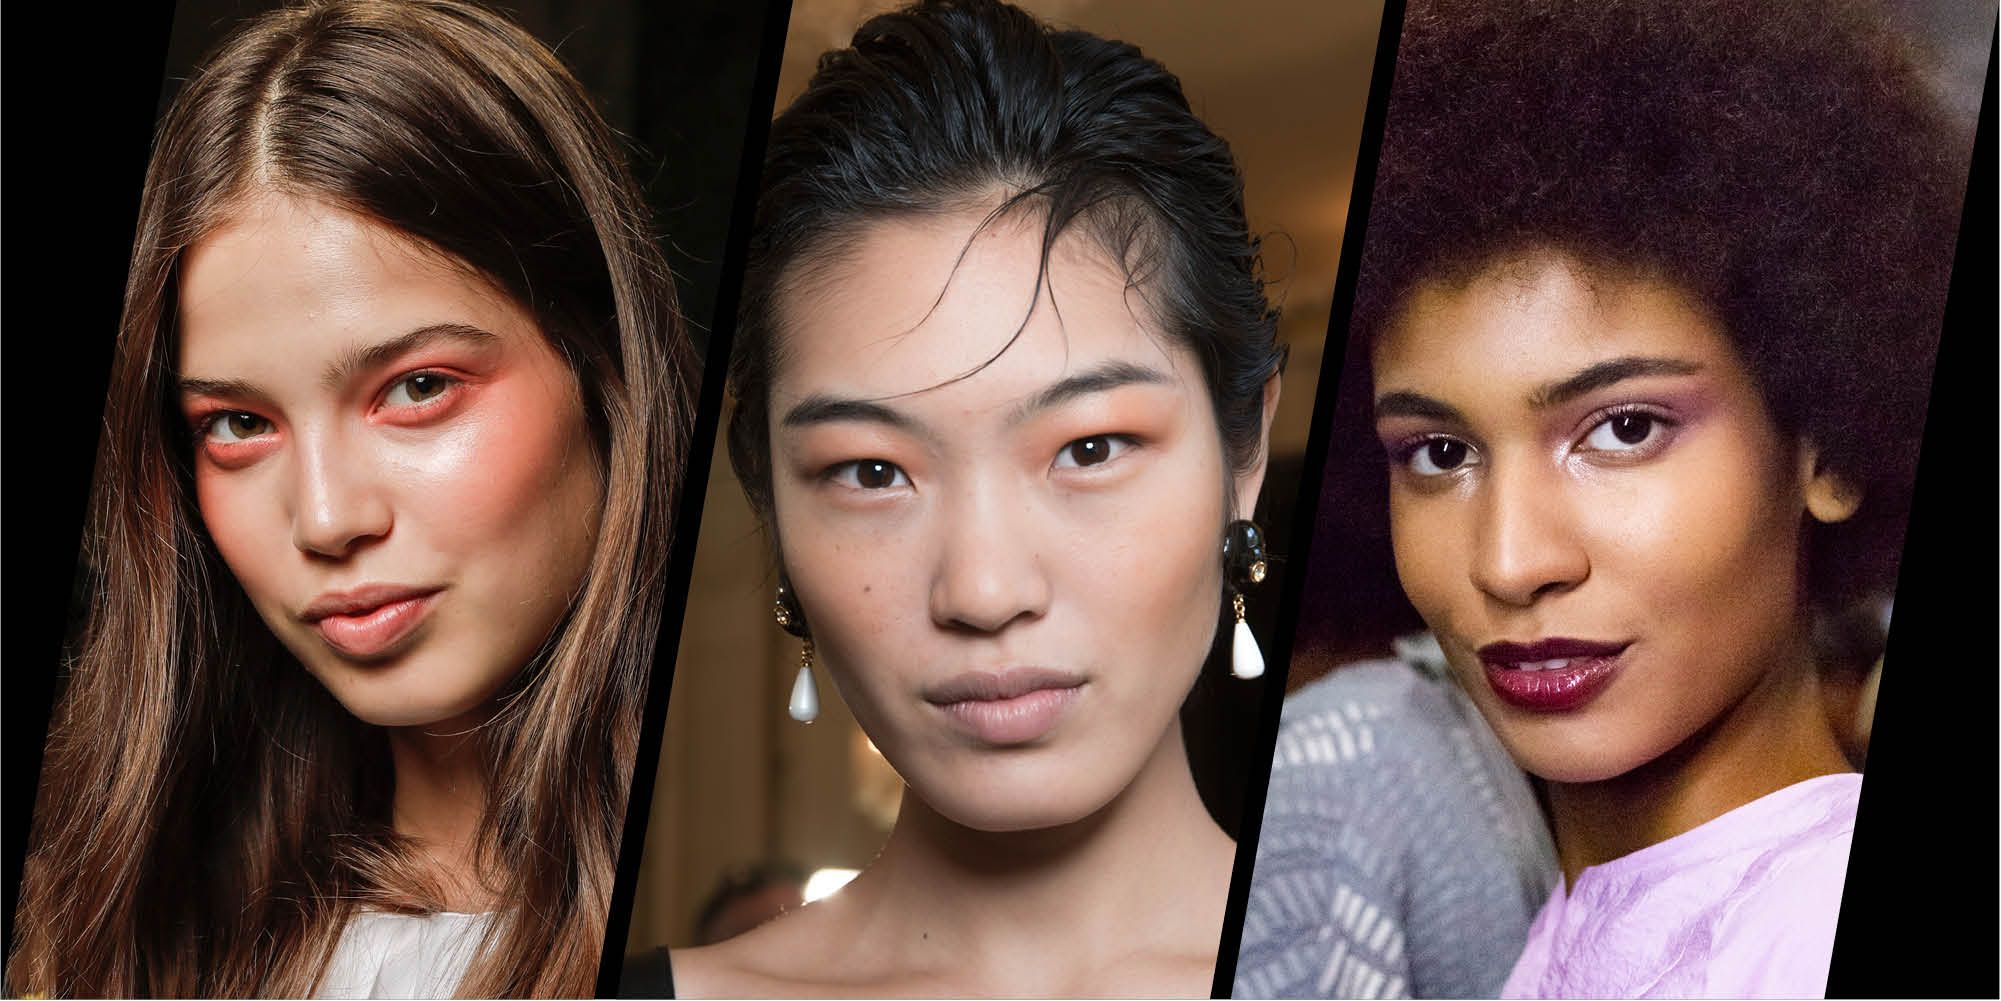 Monotone make-up trend spring/summer 2019